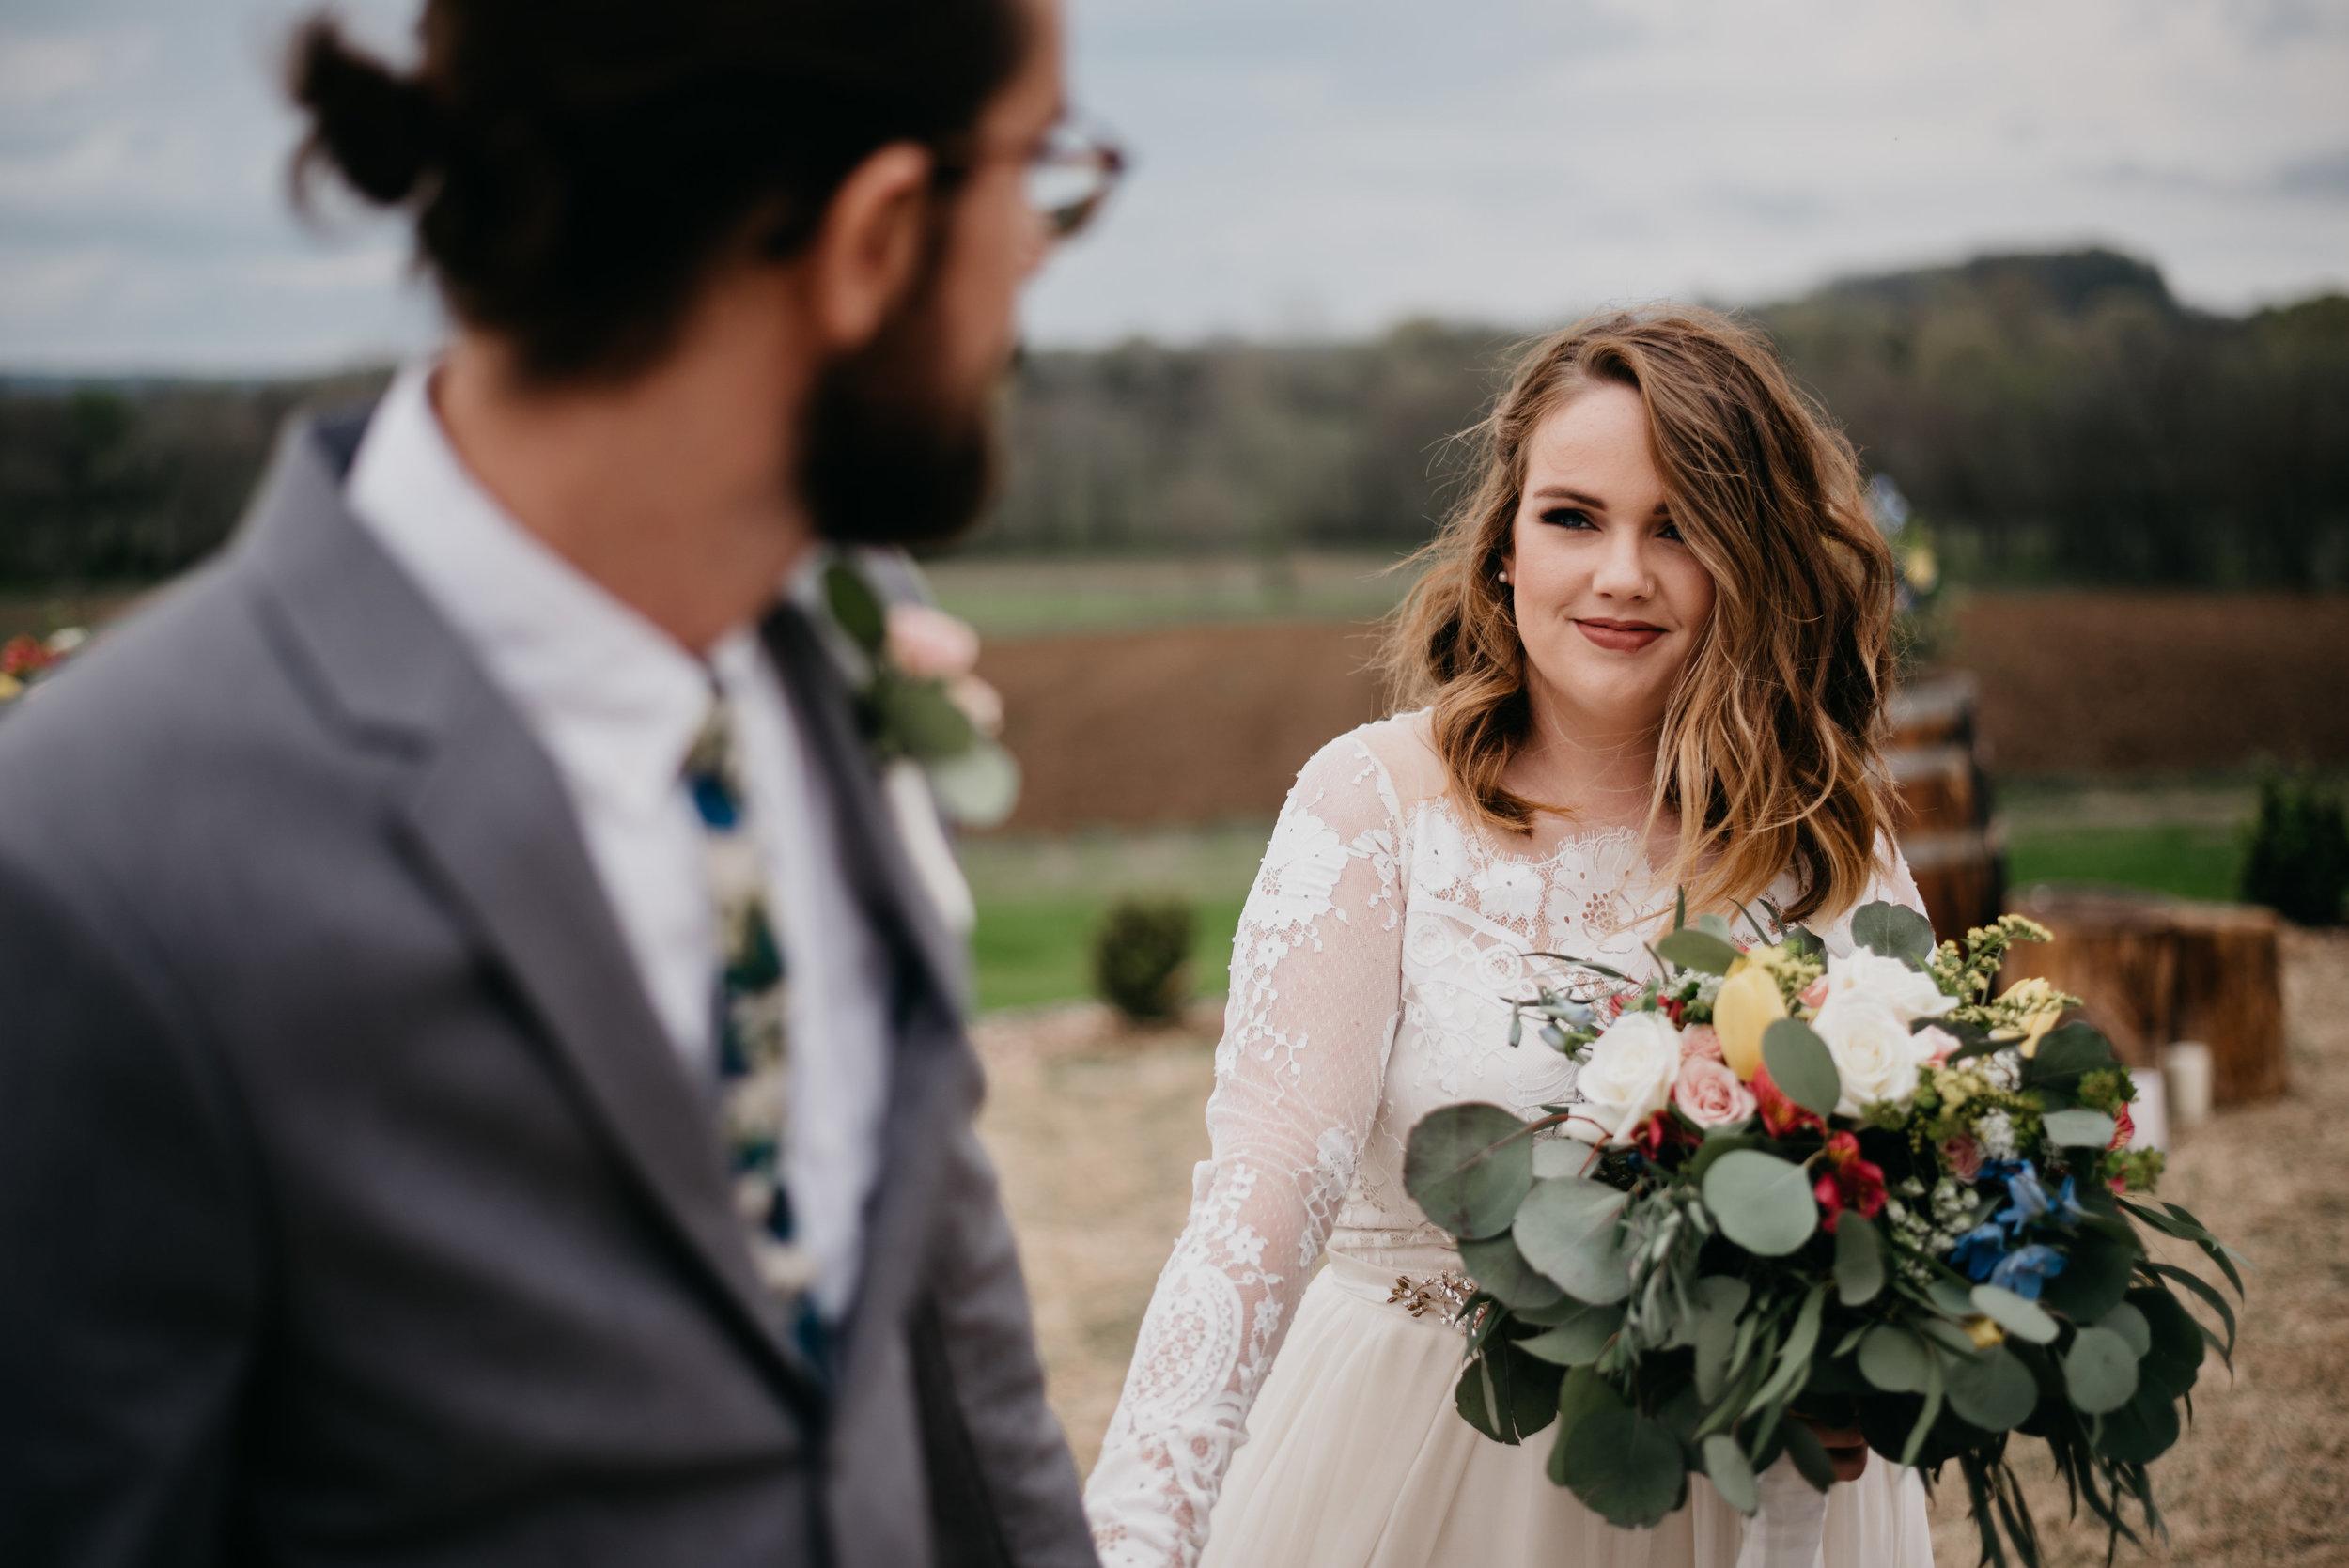 Allenbrooke-Farms-Nashville-Wedding-Photographers 7.jpg